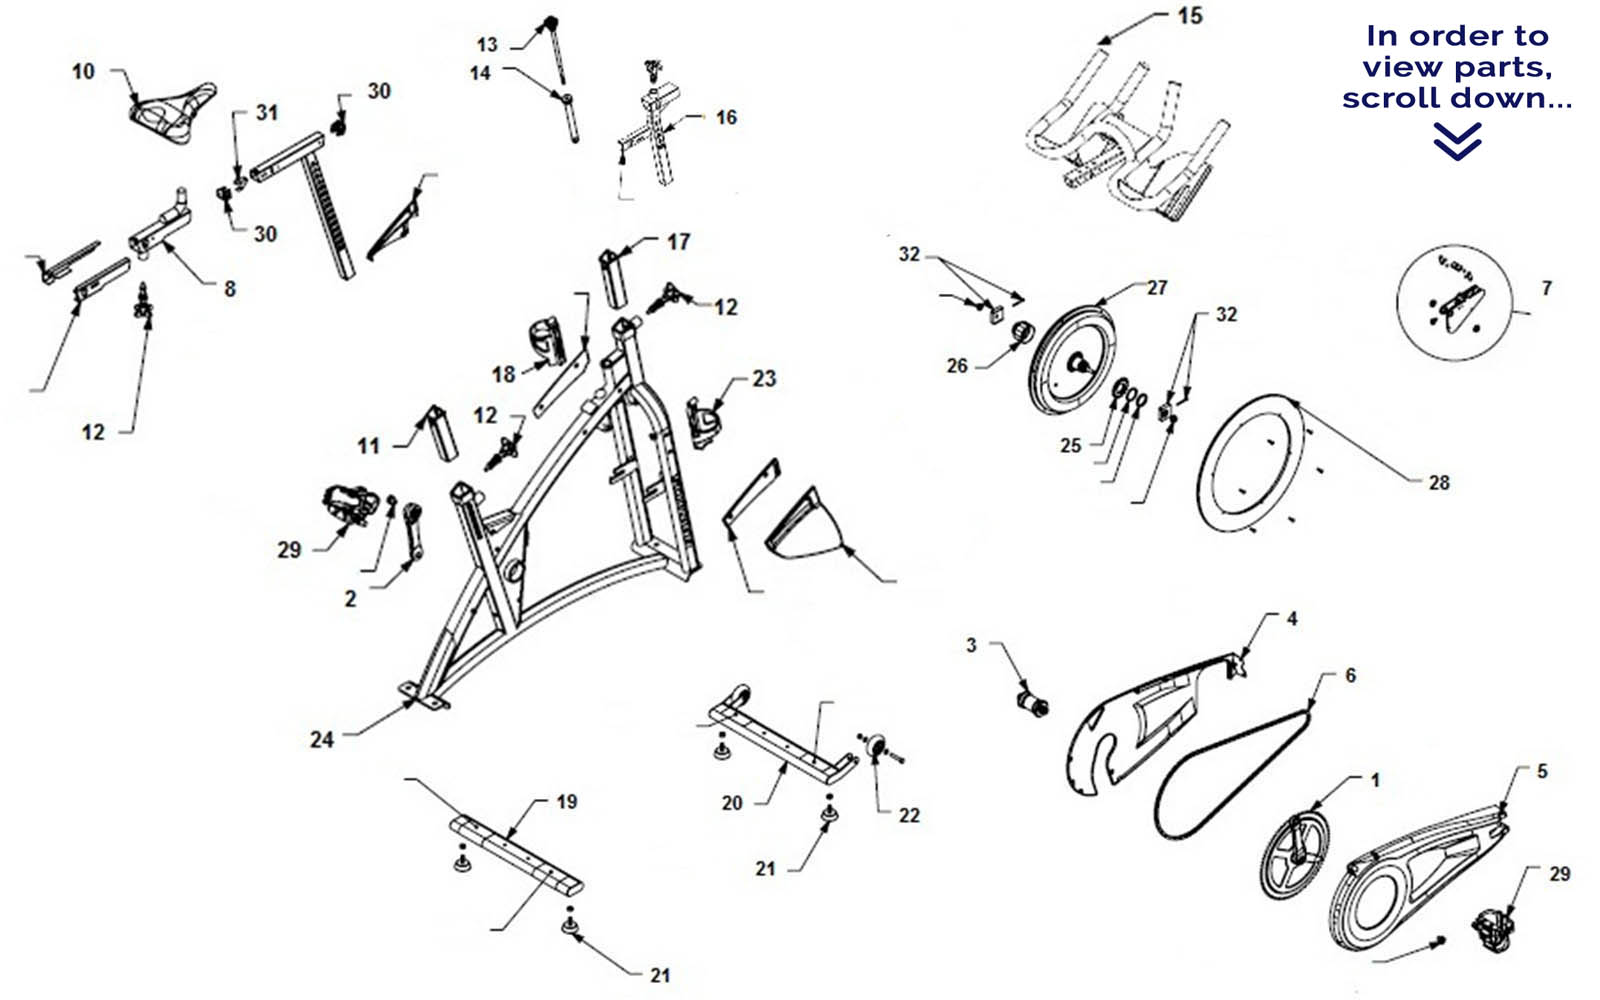 Schwinn Ac Sport Scroll Down To View Parts